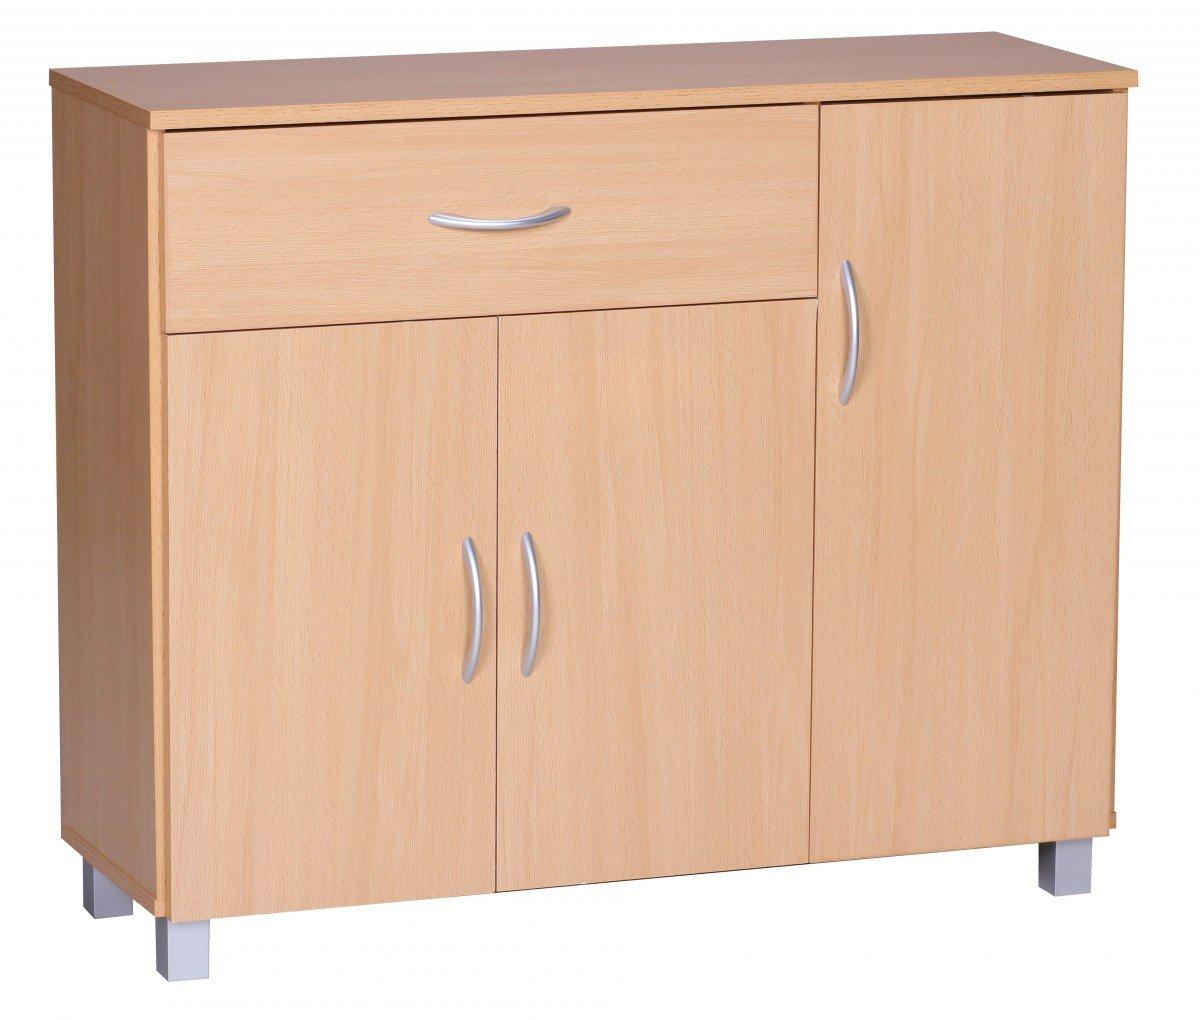 KadimaDesign Sideboard Beech 90 x 75 cm with 3 doors & 1 drawer KADIMA DESIGN